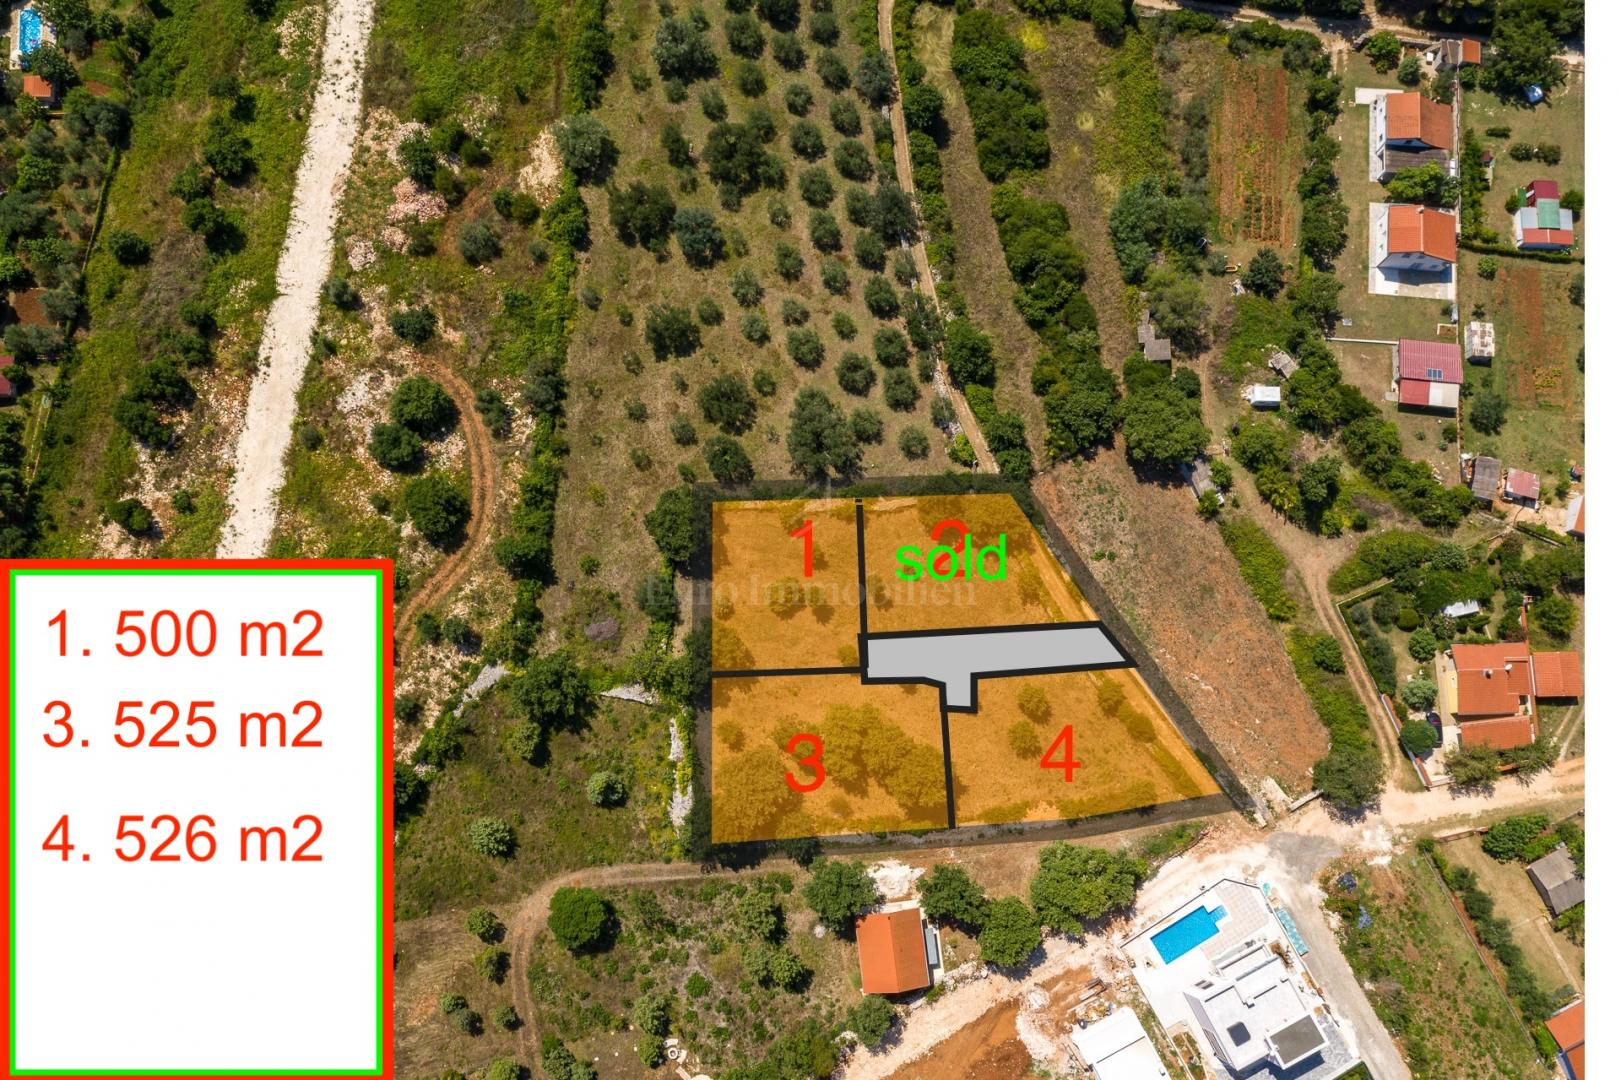 Građevinsko zemljište 500 m2!